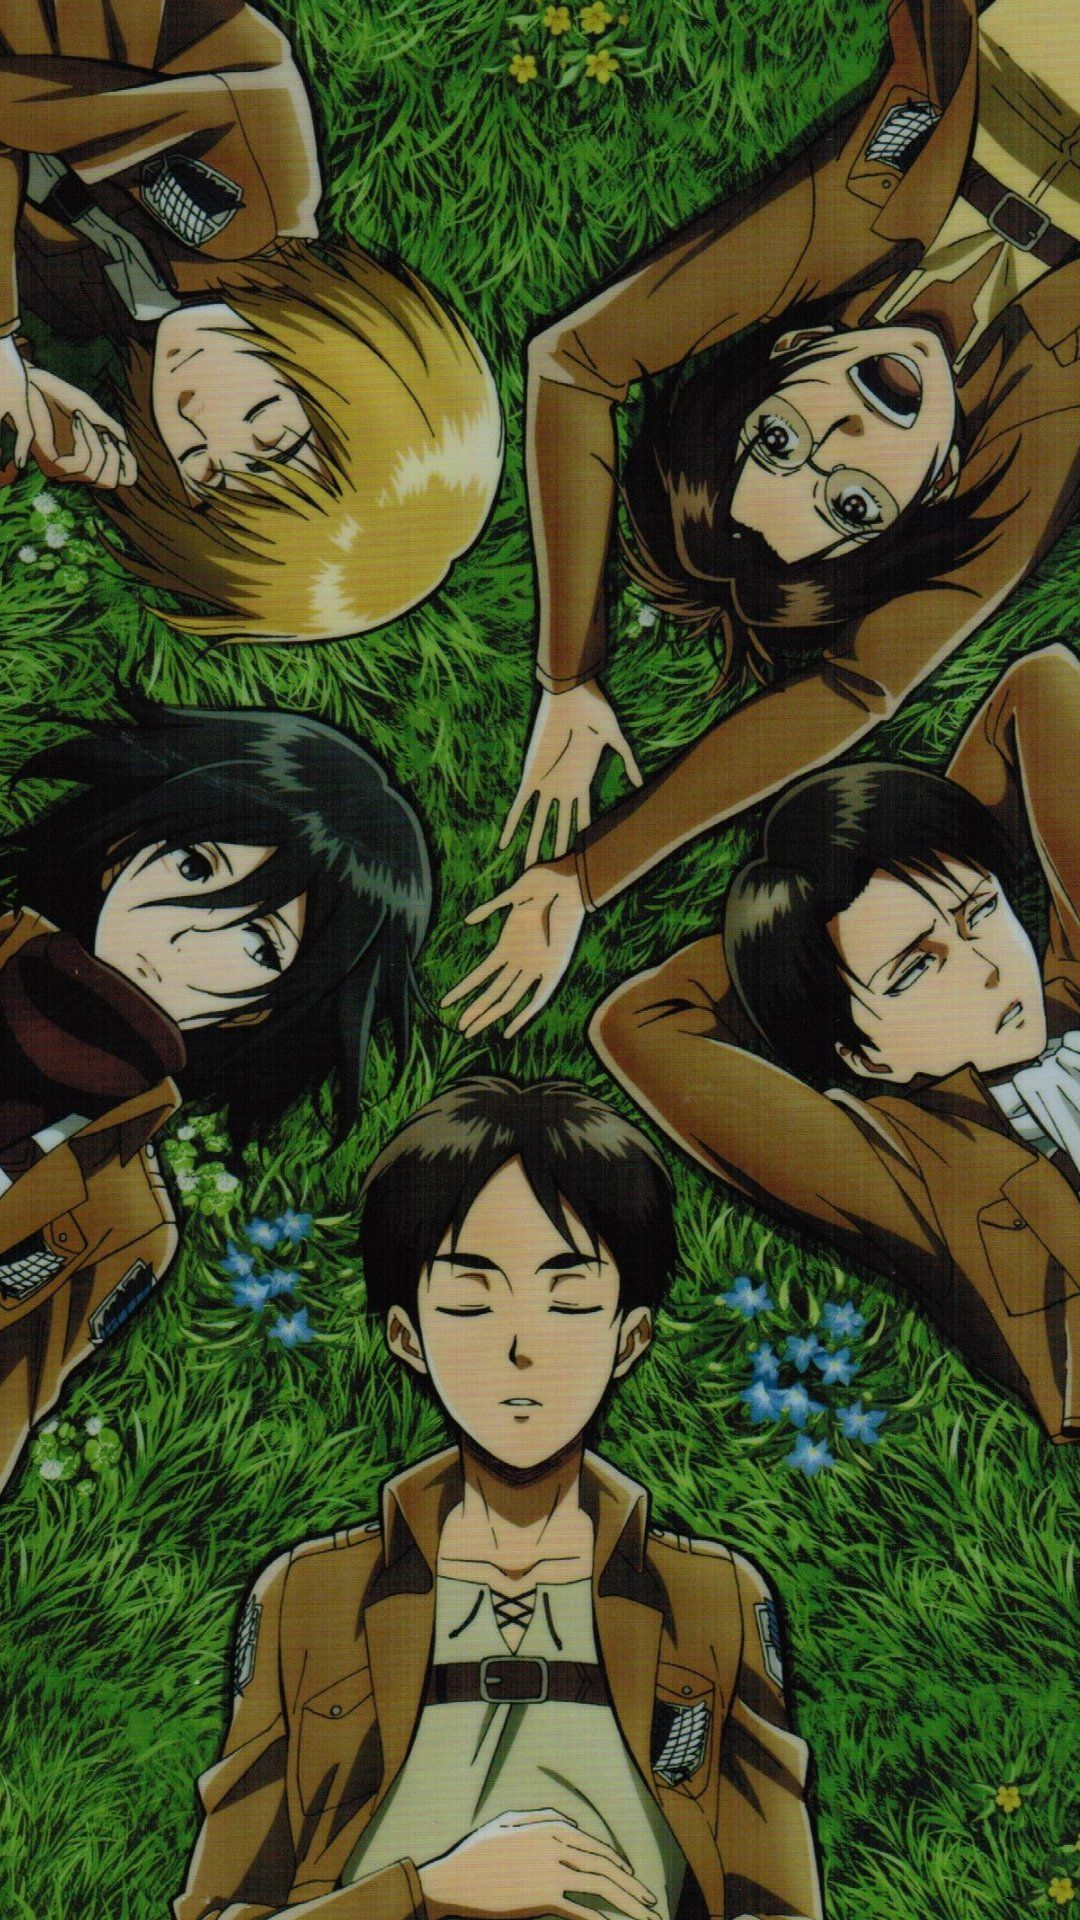 shingeki no kyojin Part 5 - NehDEF/100 - Anime Image